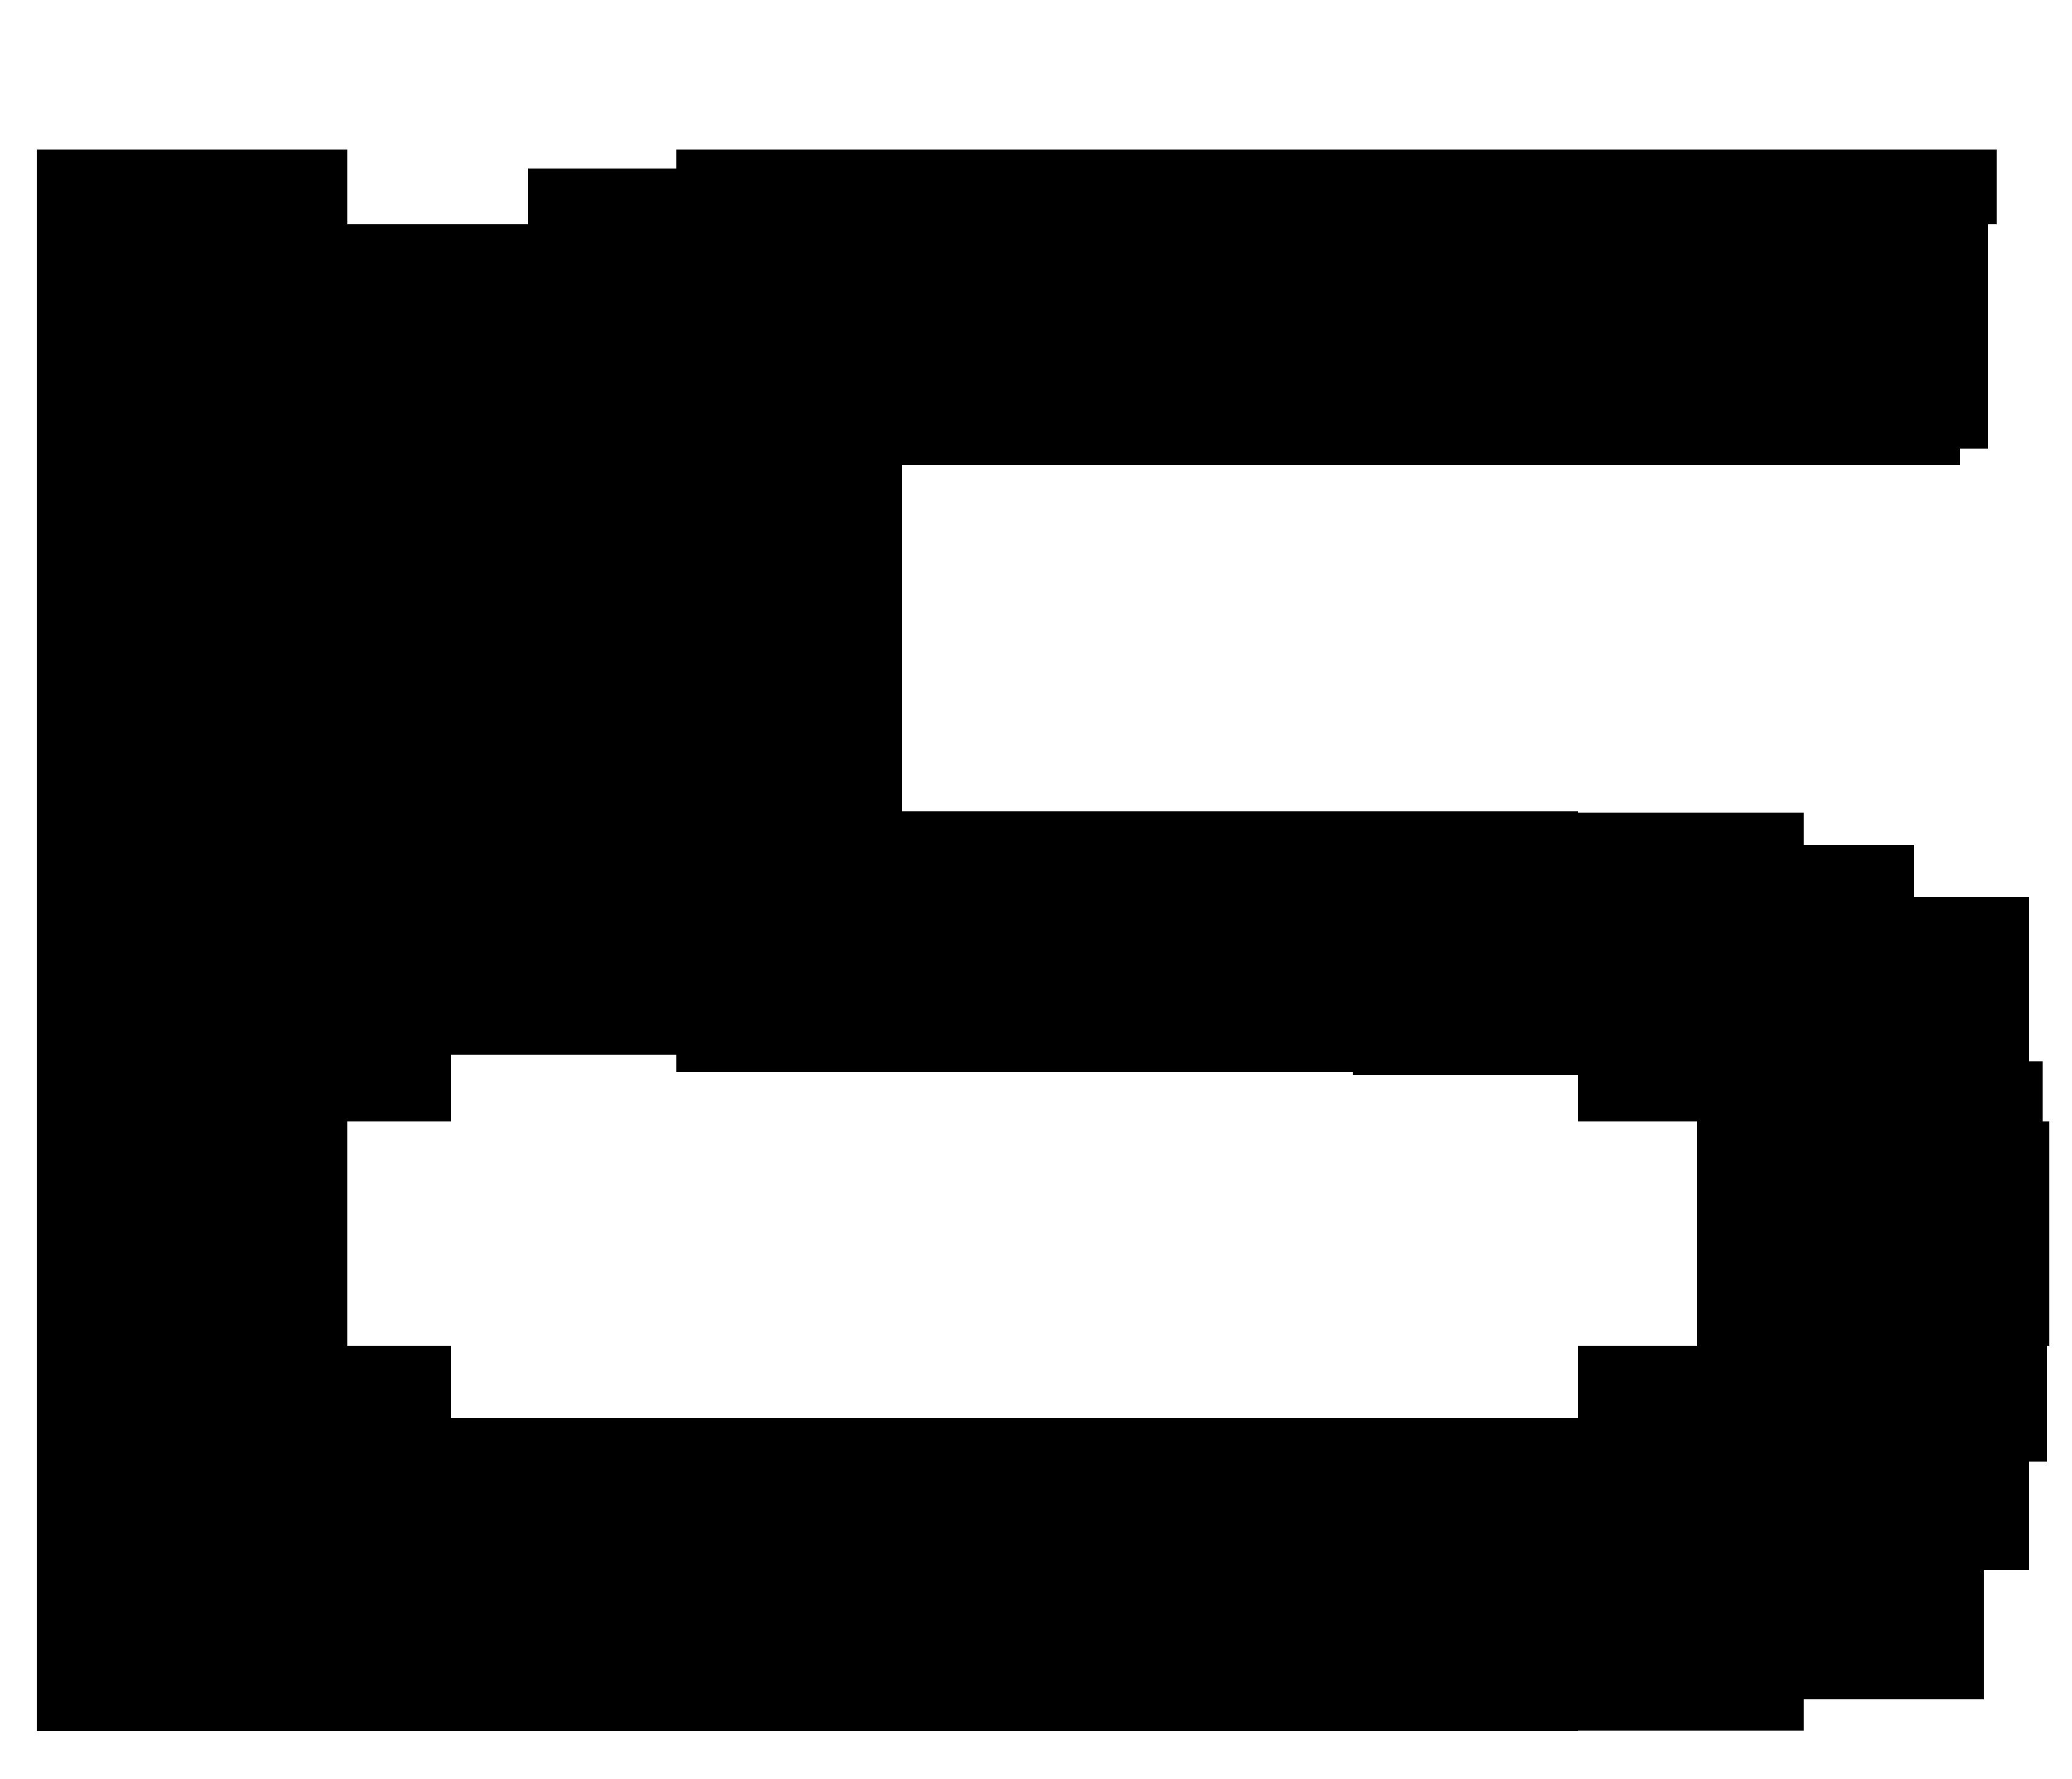 File Logo Hd Adesivo Loja Png Wikimedia Commons -> Adesivo Com Foto